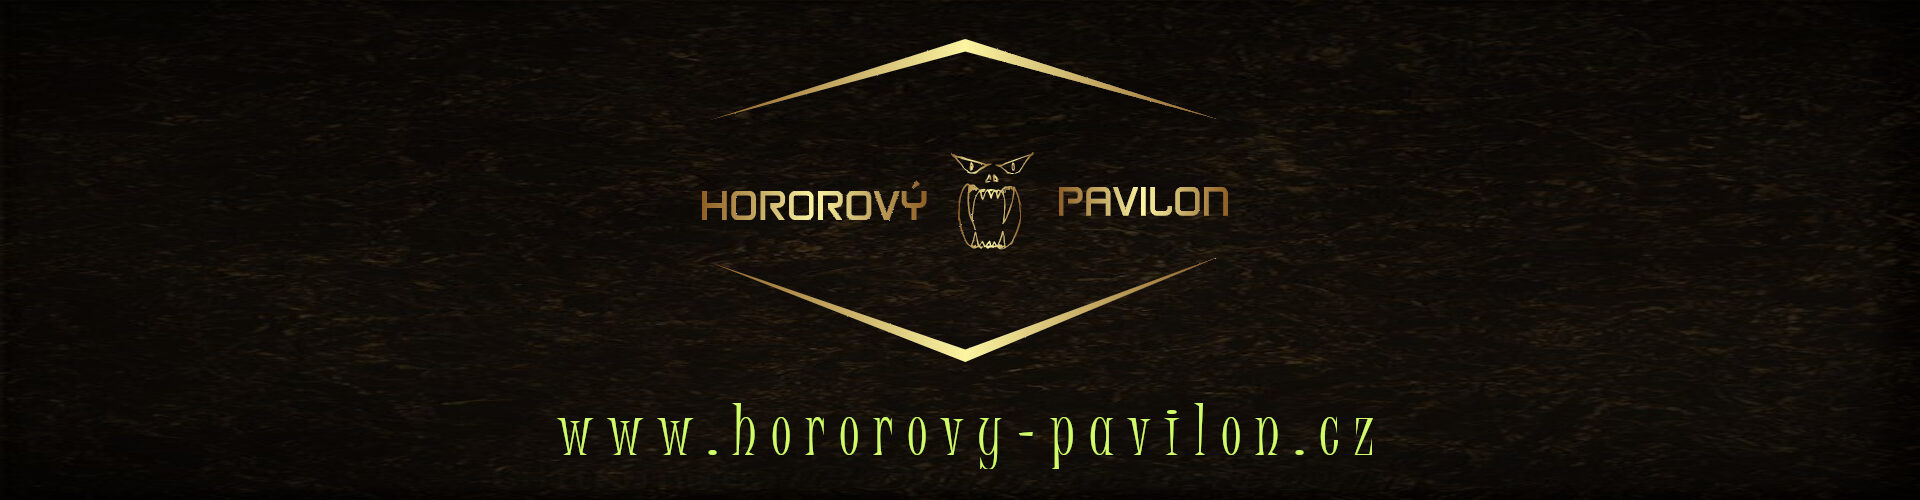 www.hororovy-pavilon.cz